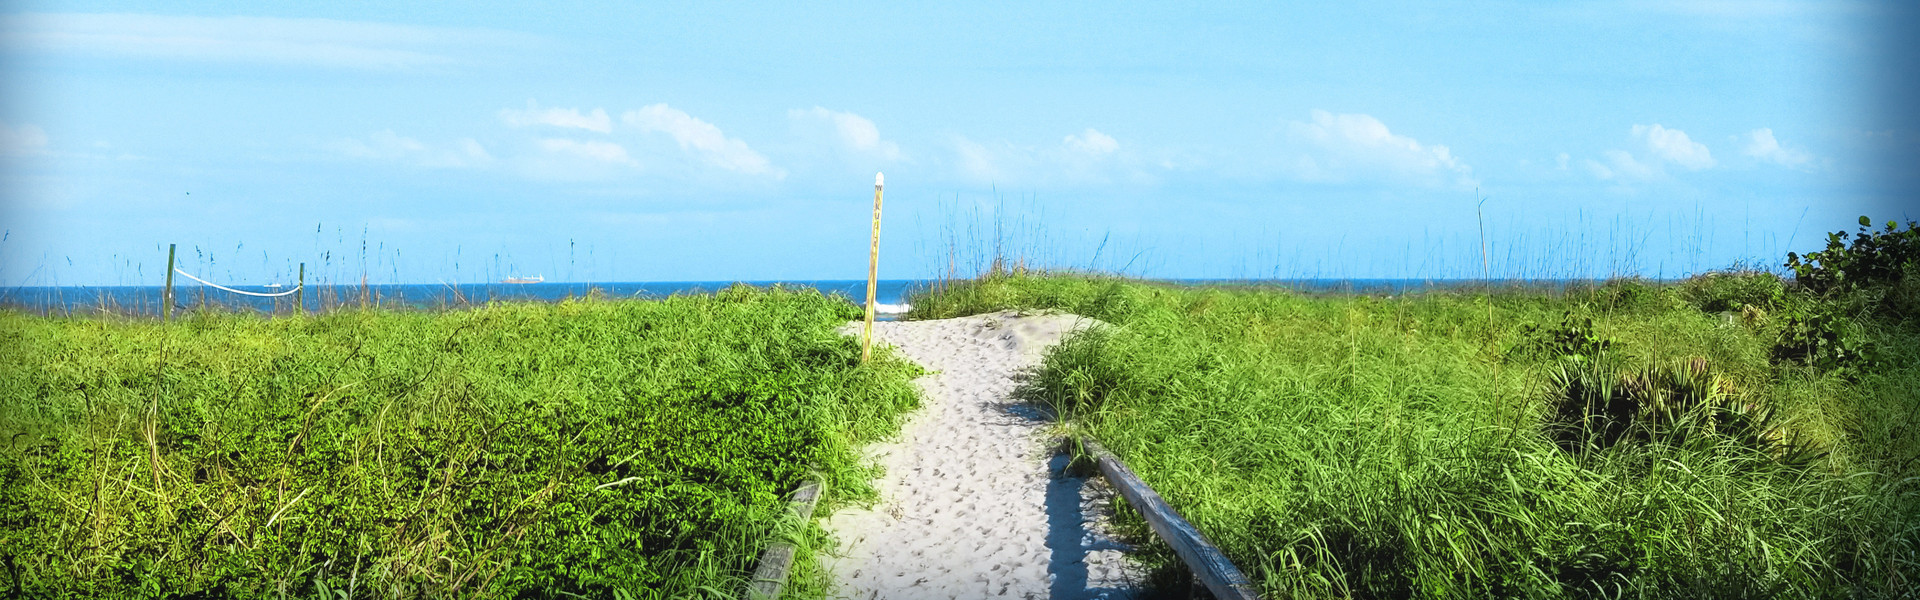 Cocoa Beach Oceanfront Hotel near Cocoa Beach and Westgate Cocoa Beach Pier | Trail